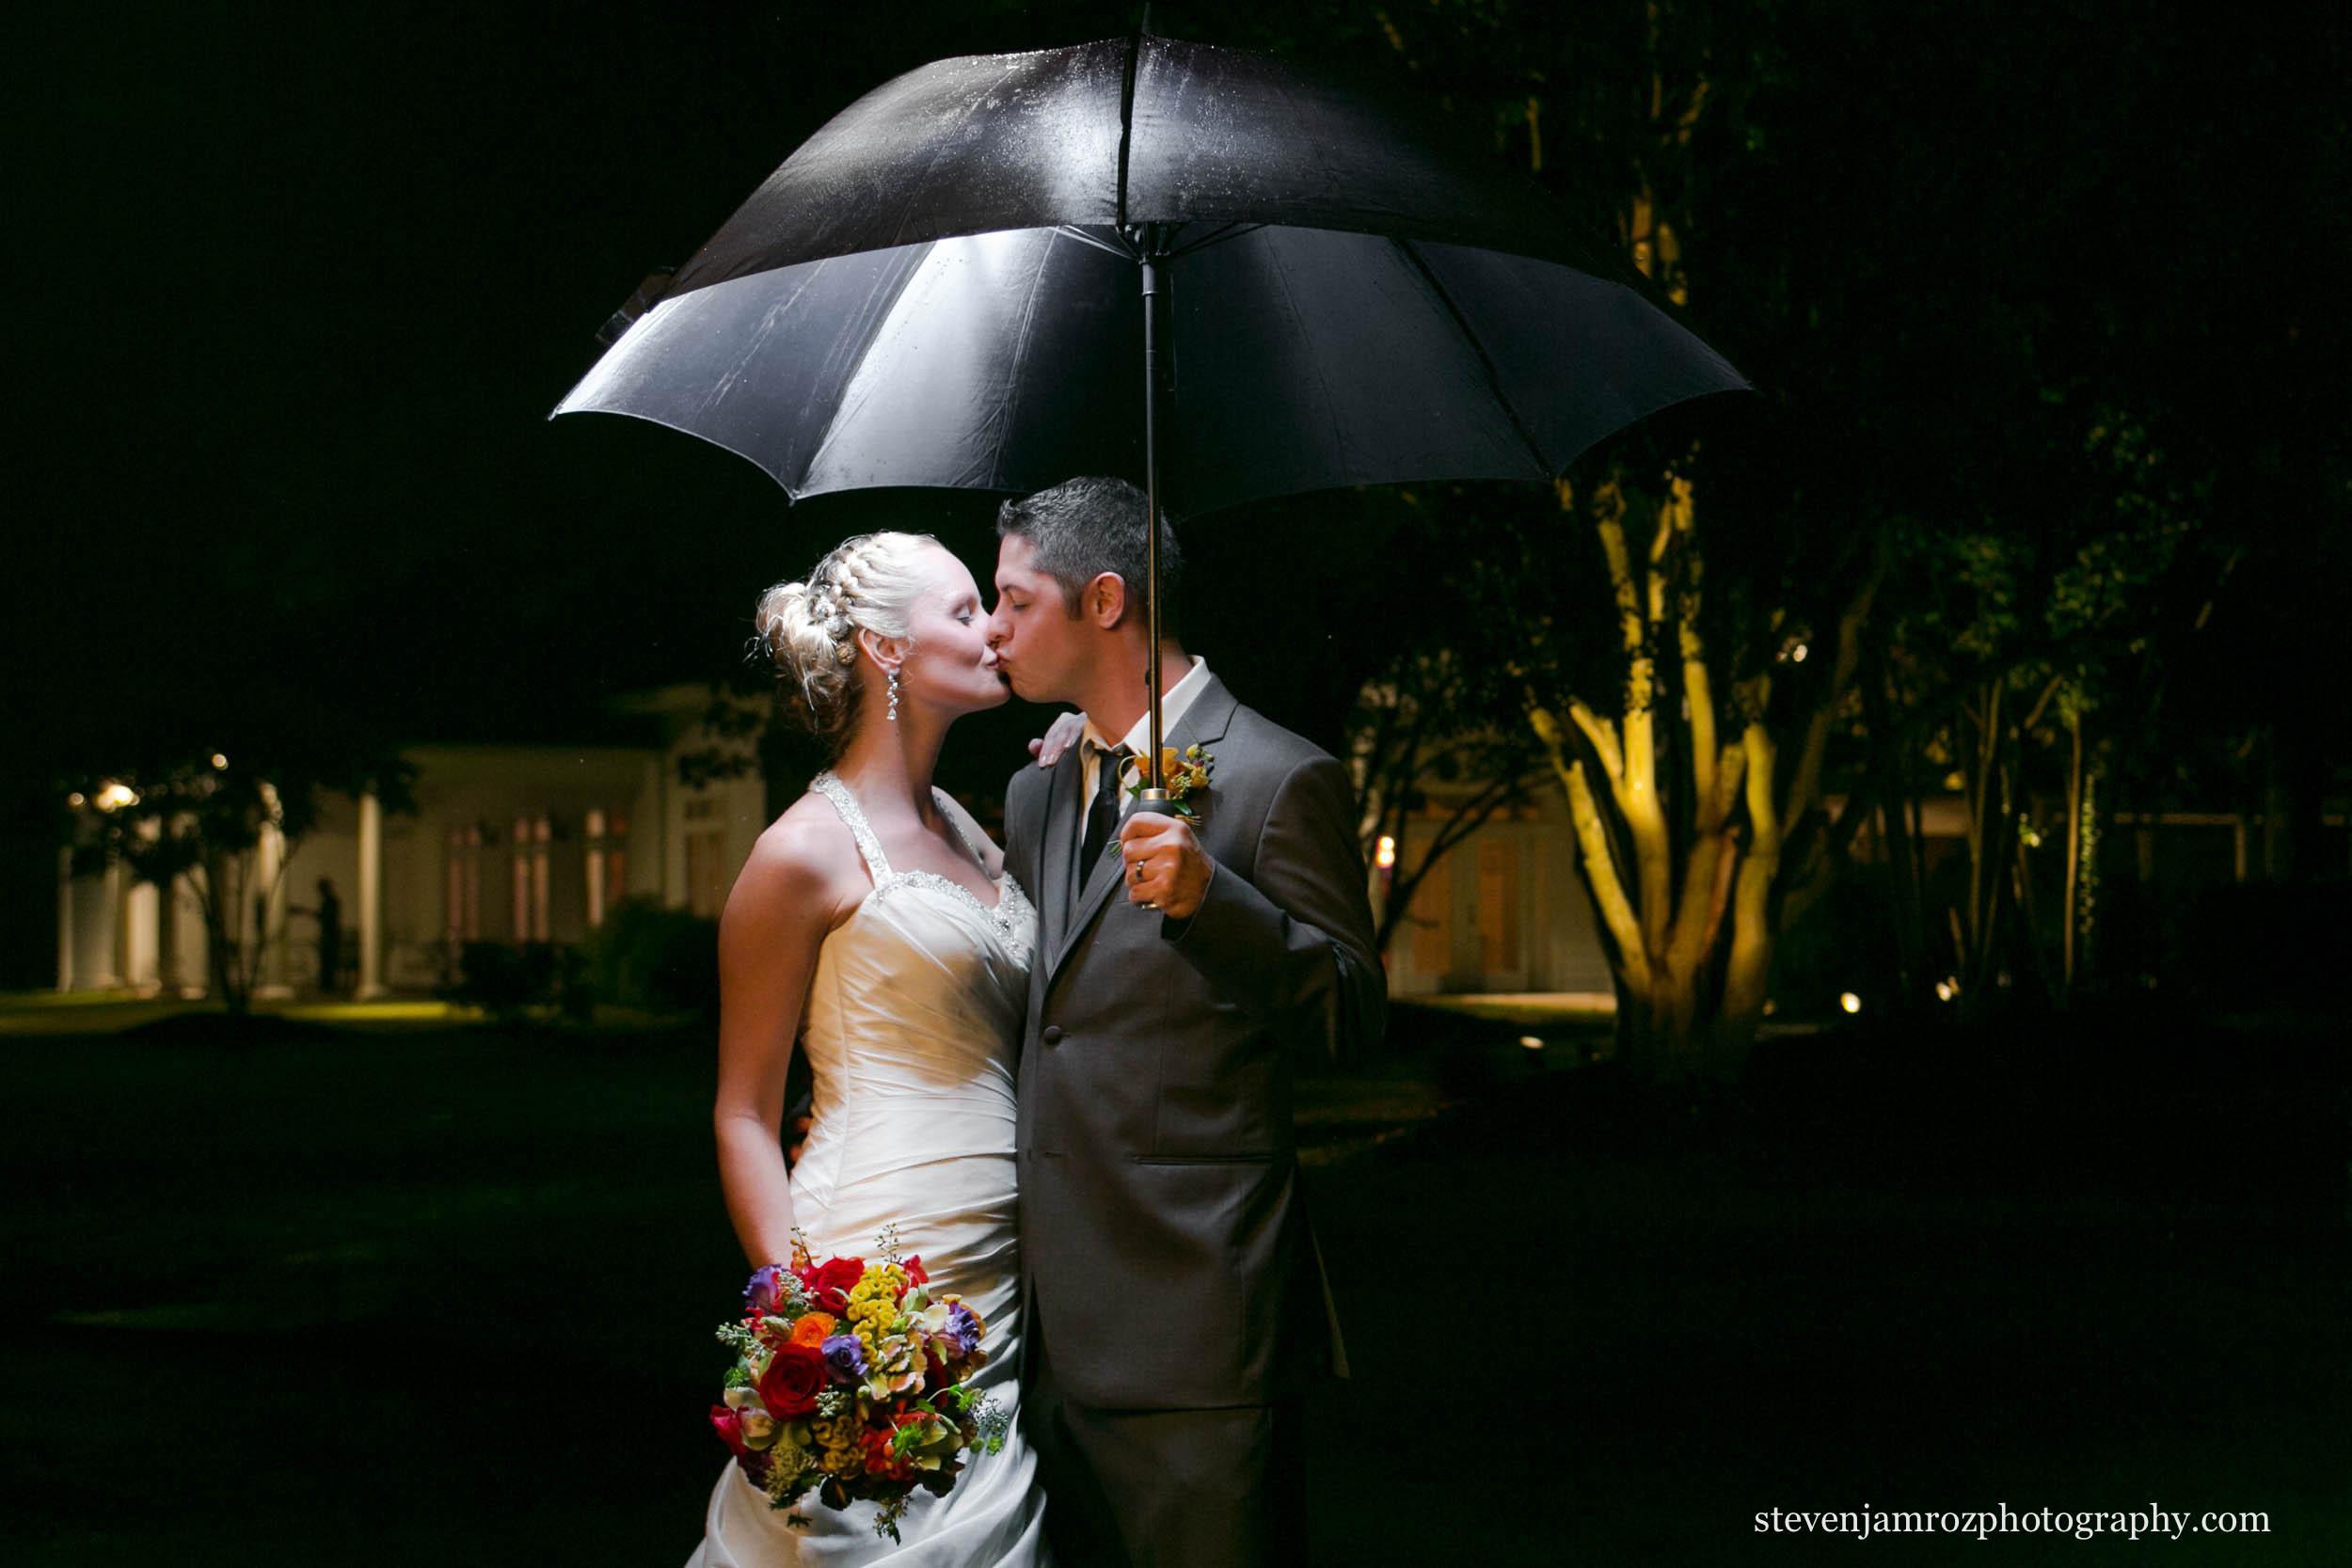 raining-hudson-manor-umbrella-night-photography-0936.jpg